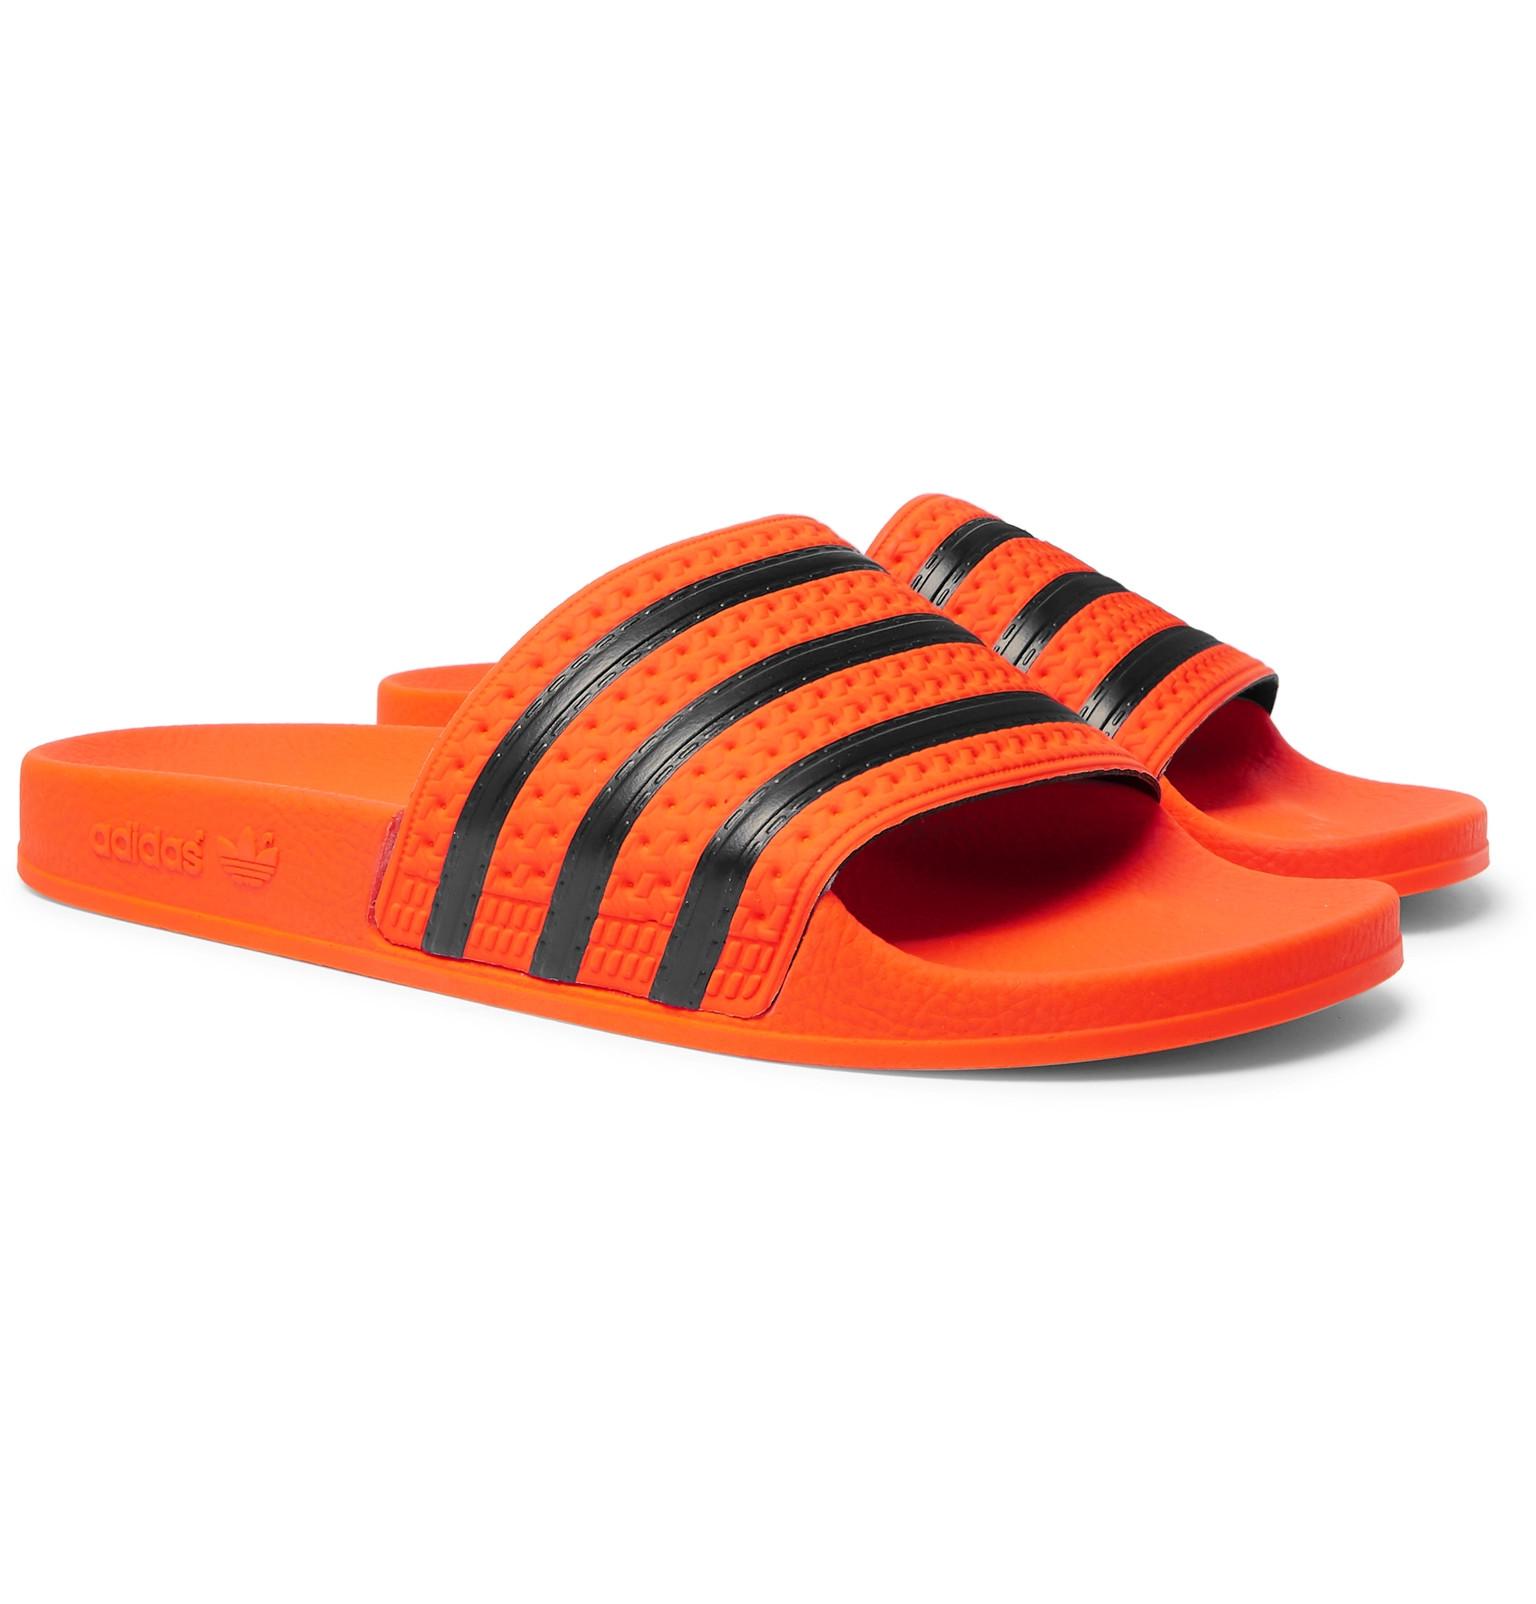 7847b3df5 adidas Originals - Adilette Textured-Rubber Slides